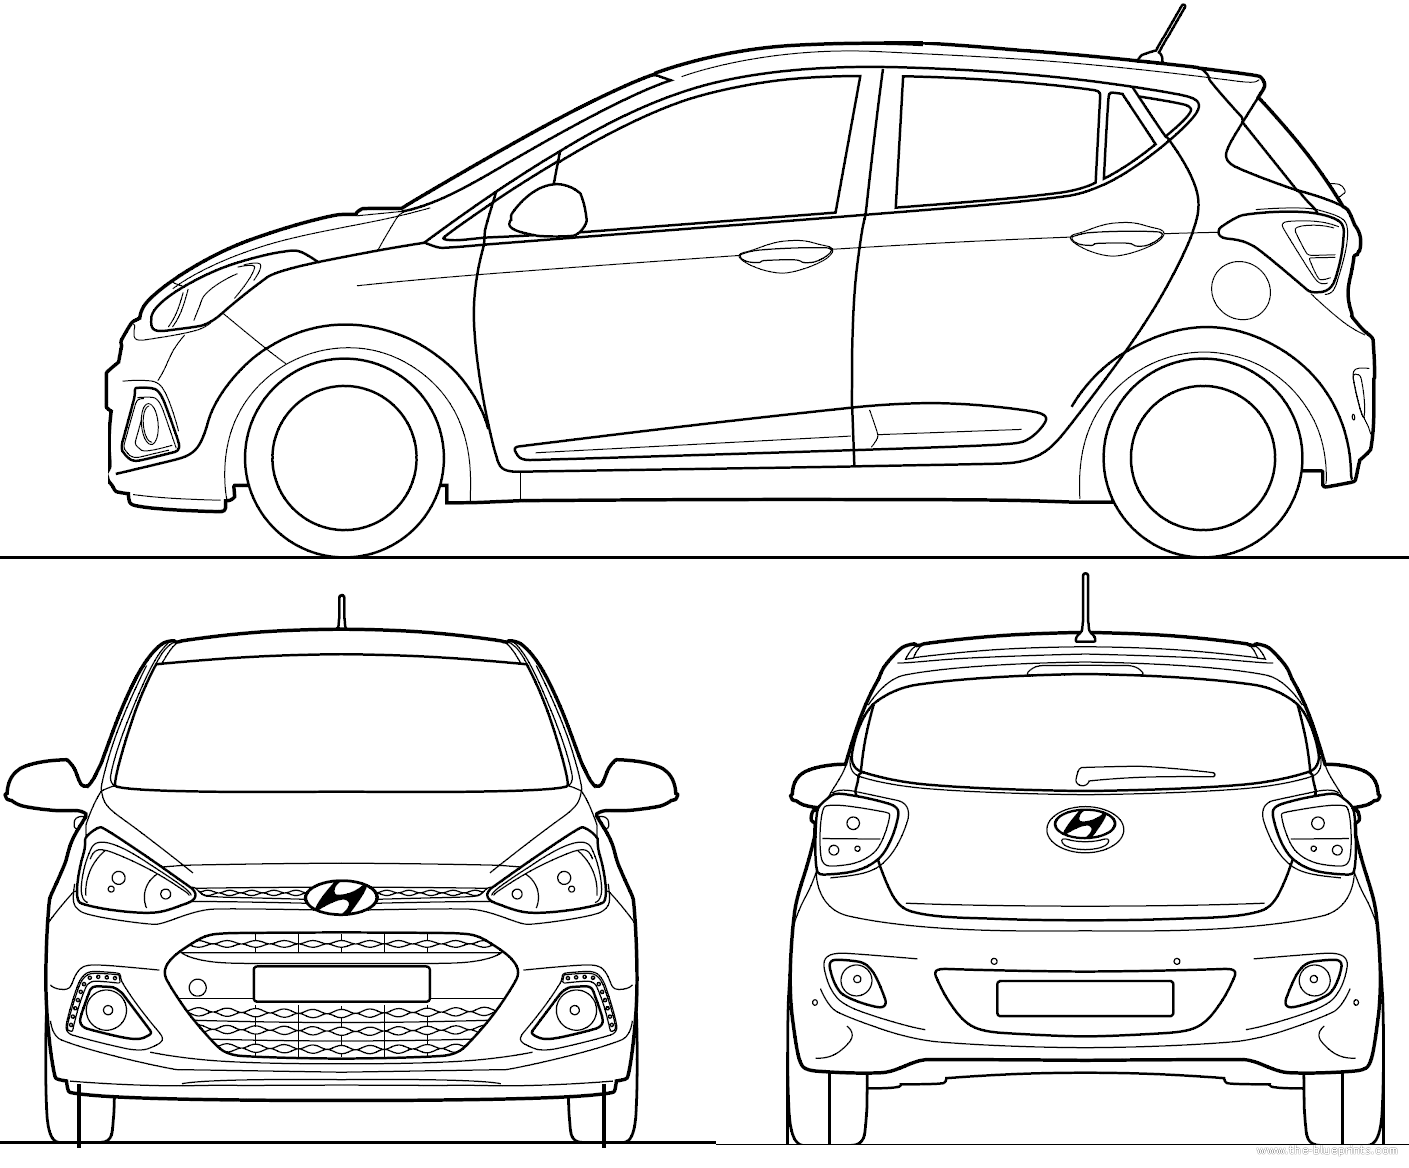 blueprints cars hyundai hyundai grand i10 2014 2 Door Charger hyundai grand i10 2014